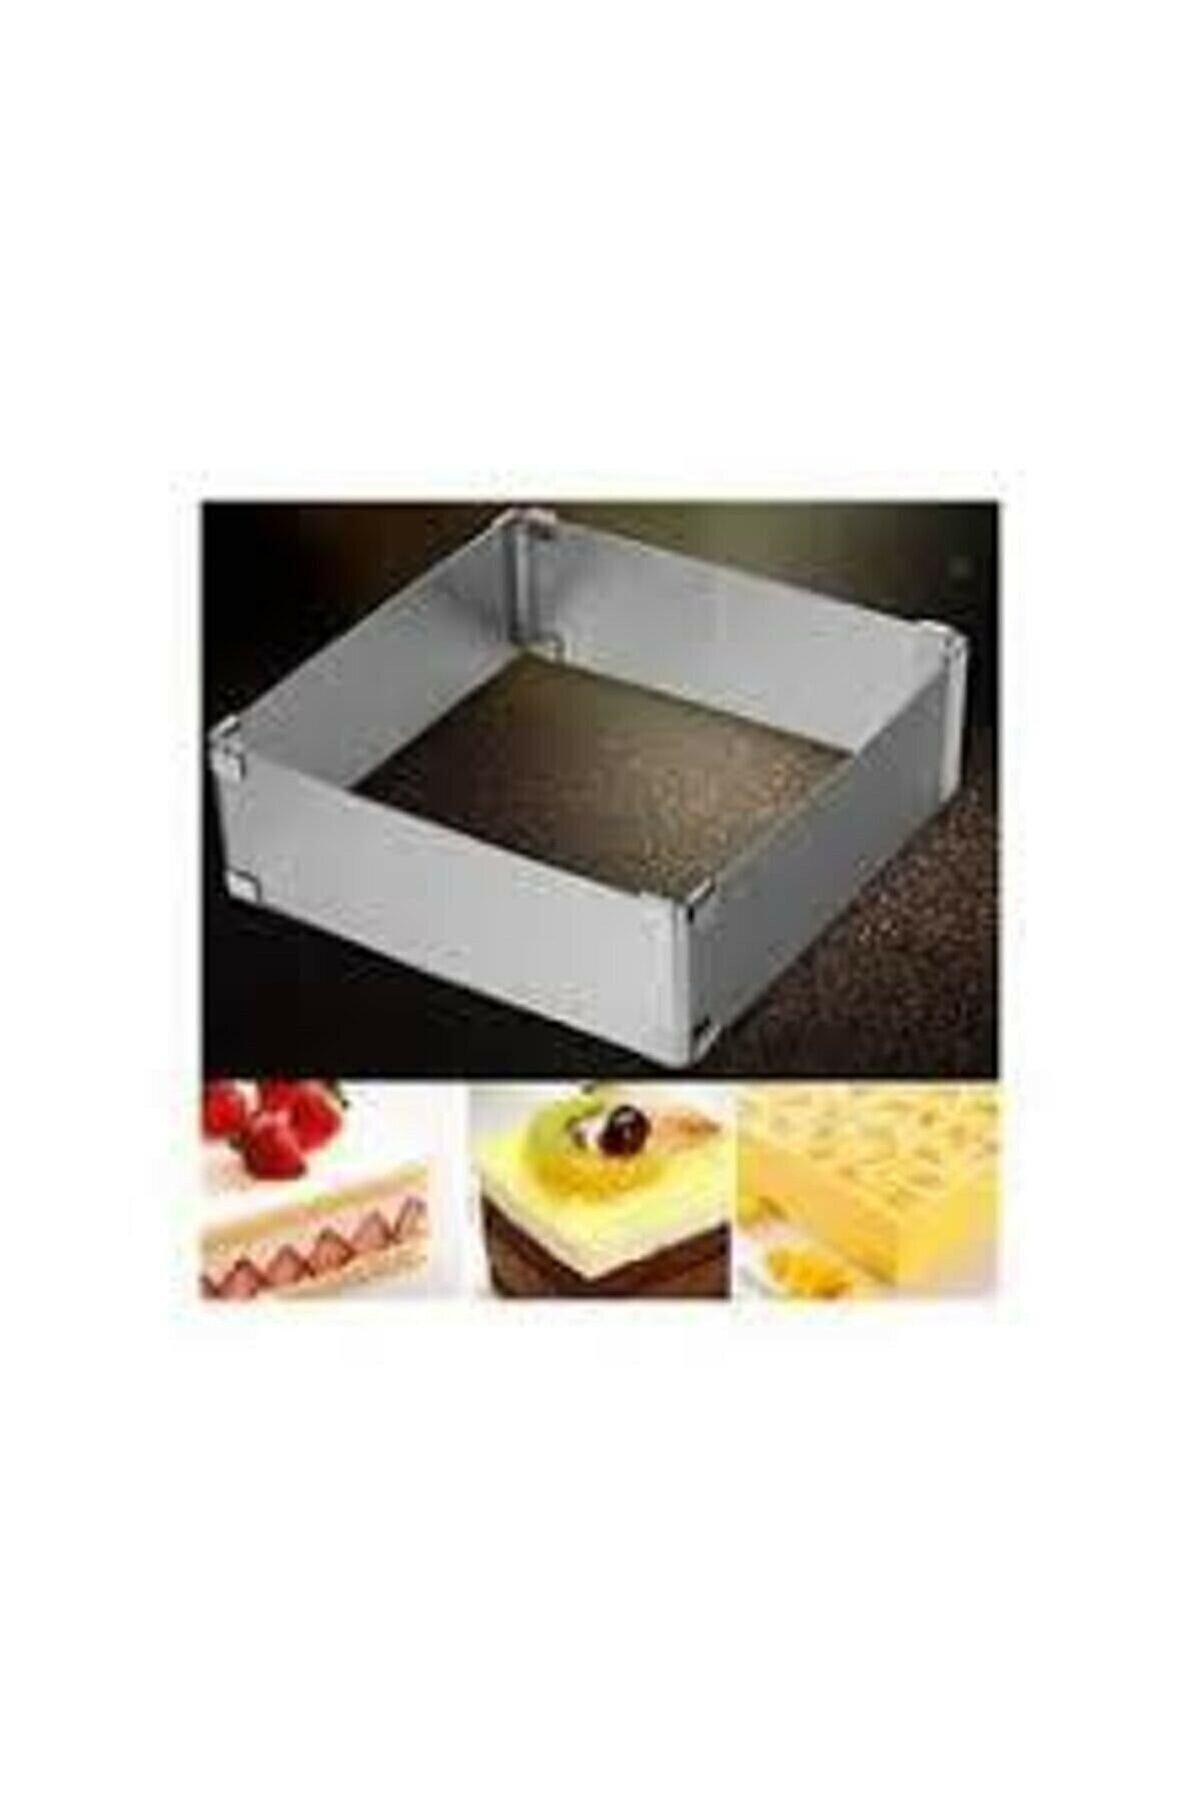 senaticaret Kare Kek Pasta Kalıbı 20x40 cm